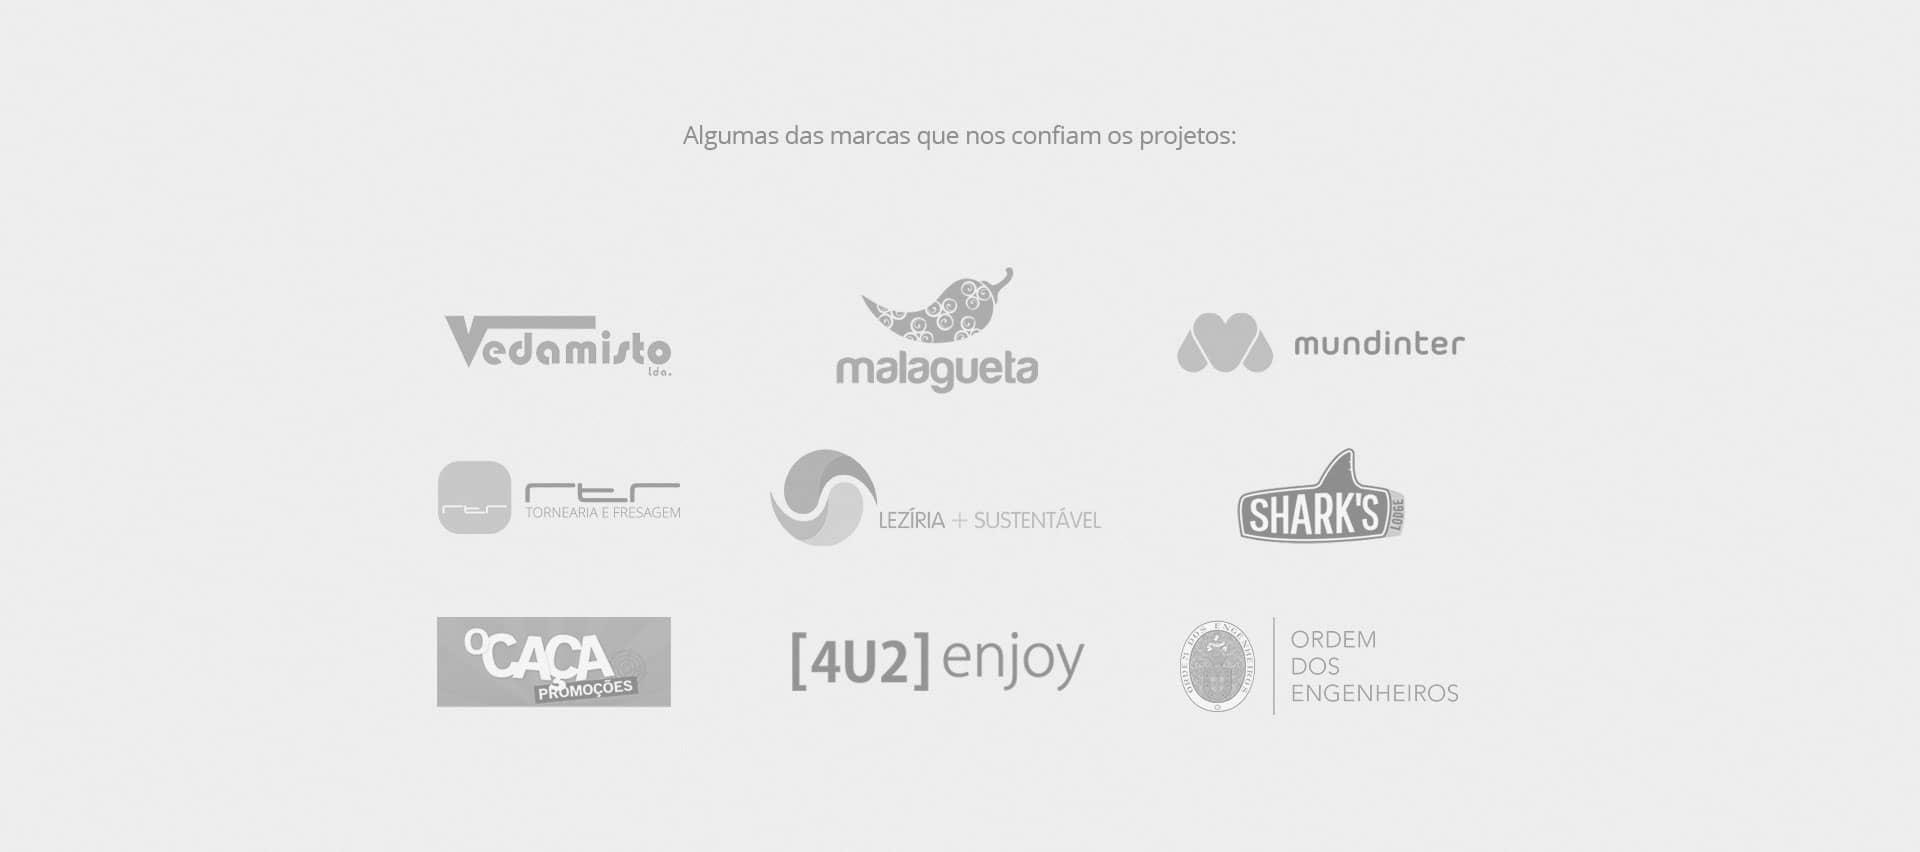 Clientes Santa Ideia Marketing & Publicidade